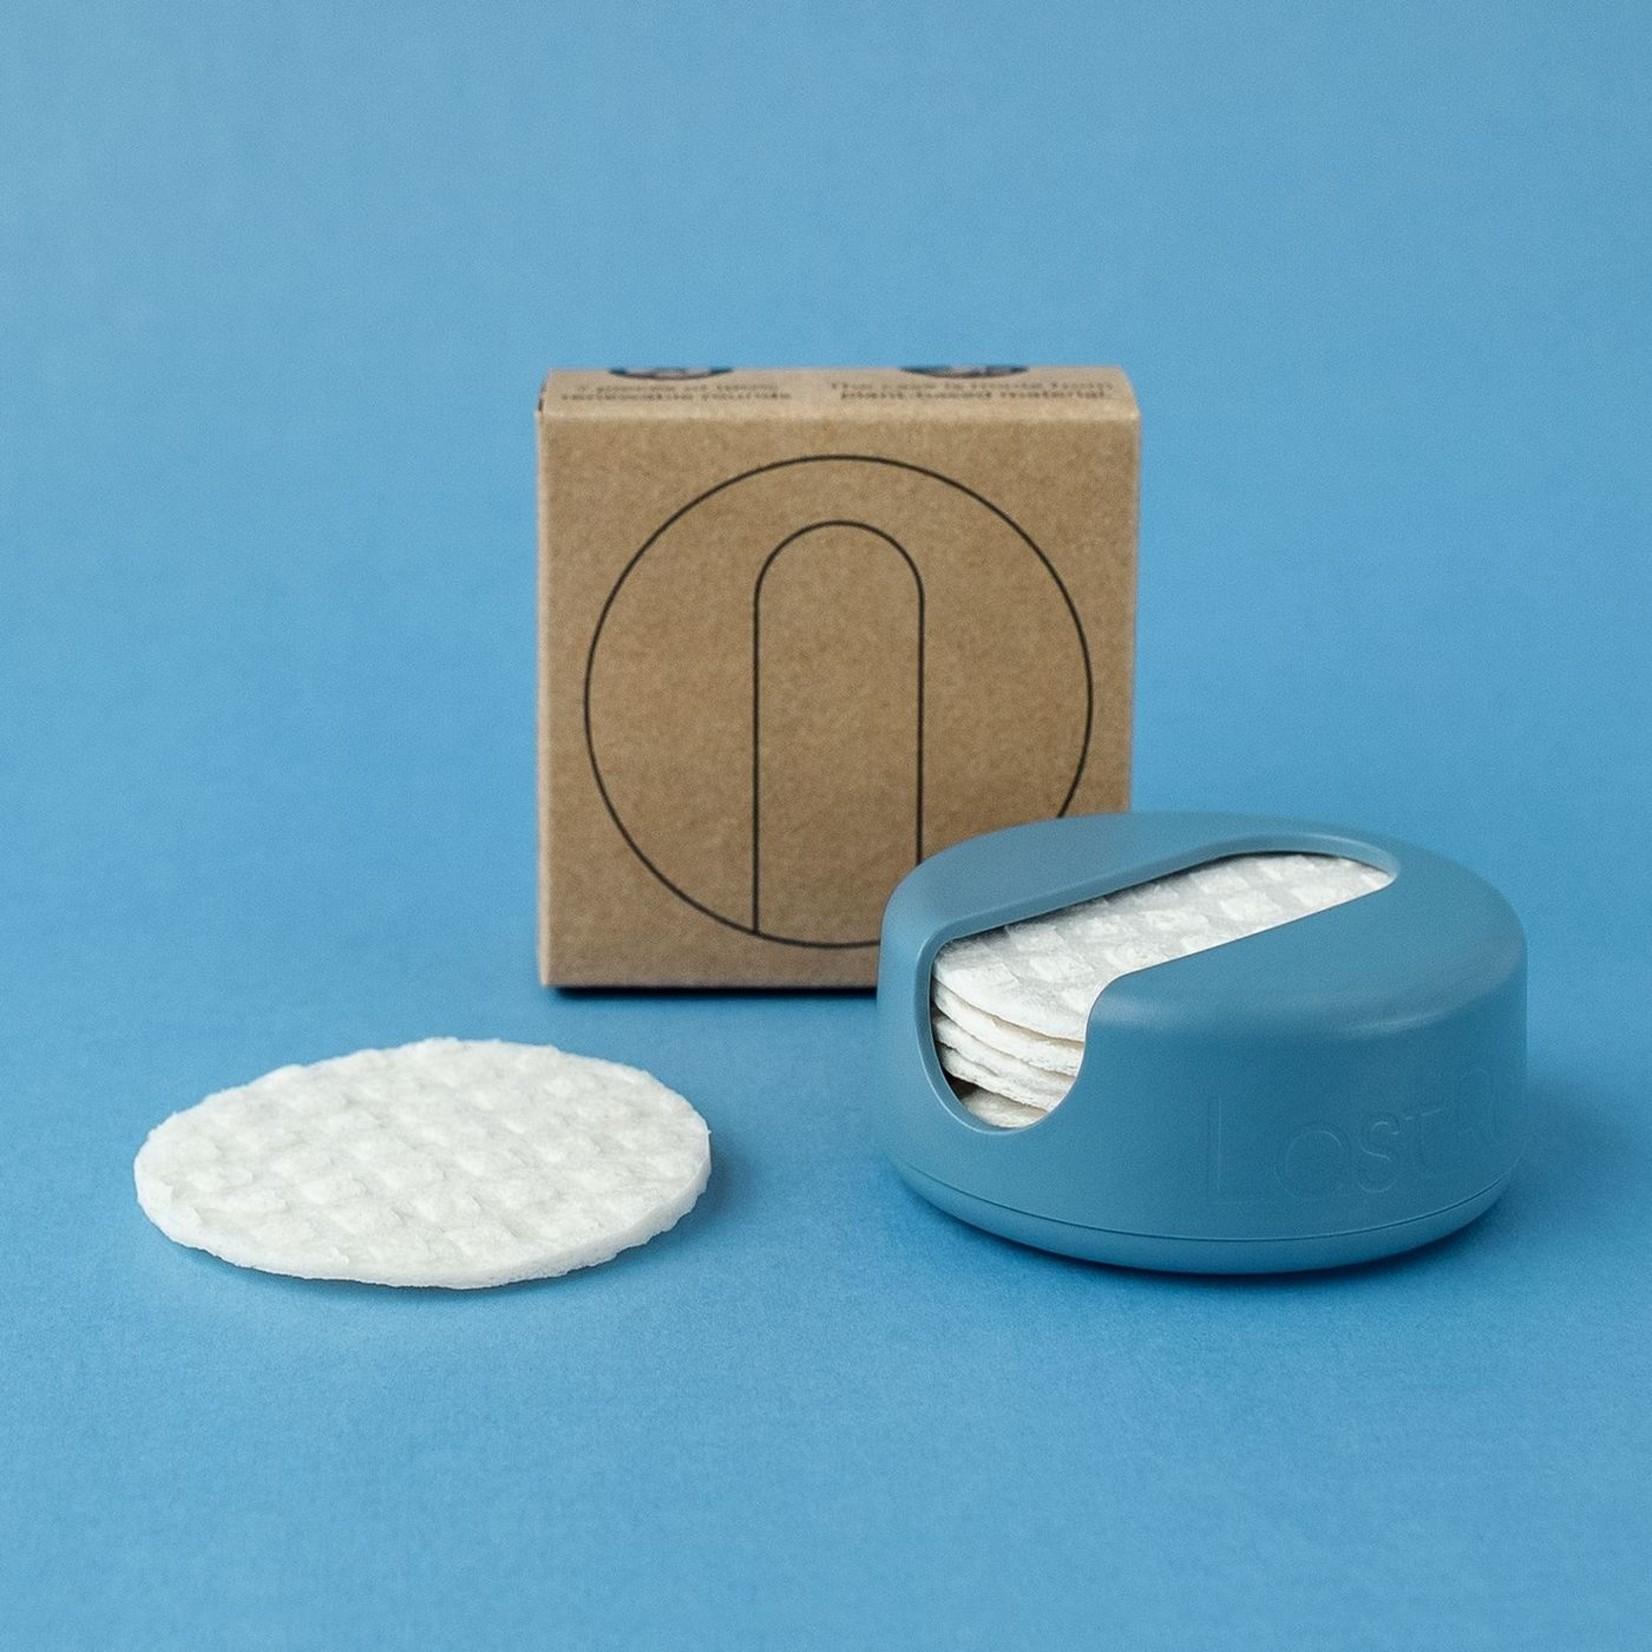 LastRound reusable makeup remover pads - blue